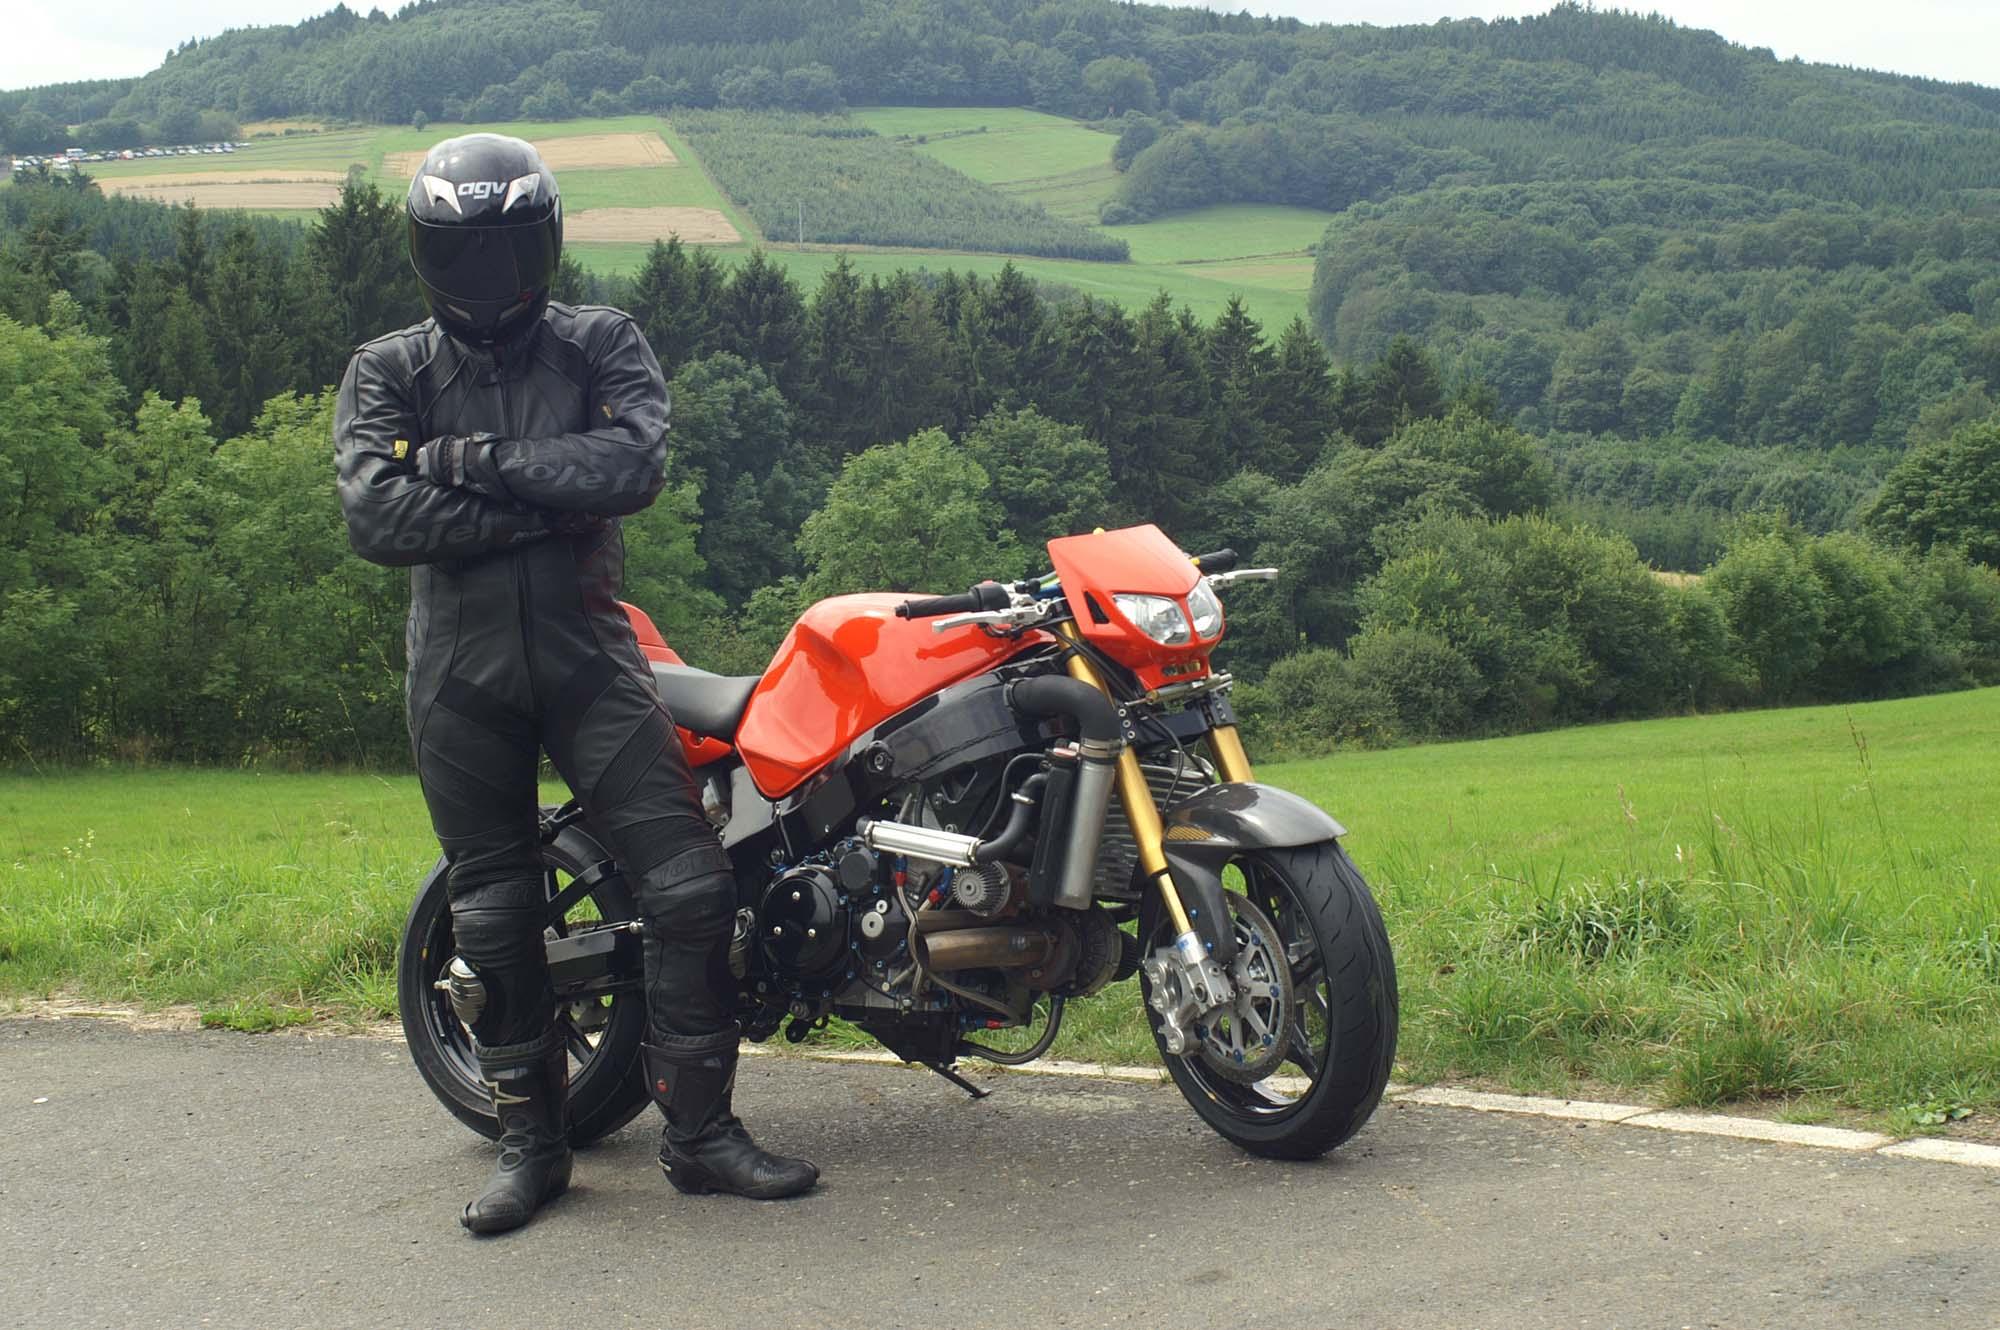 Source Ghost Rider via...